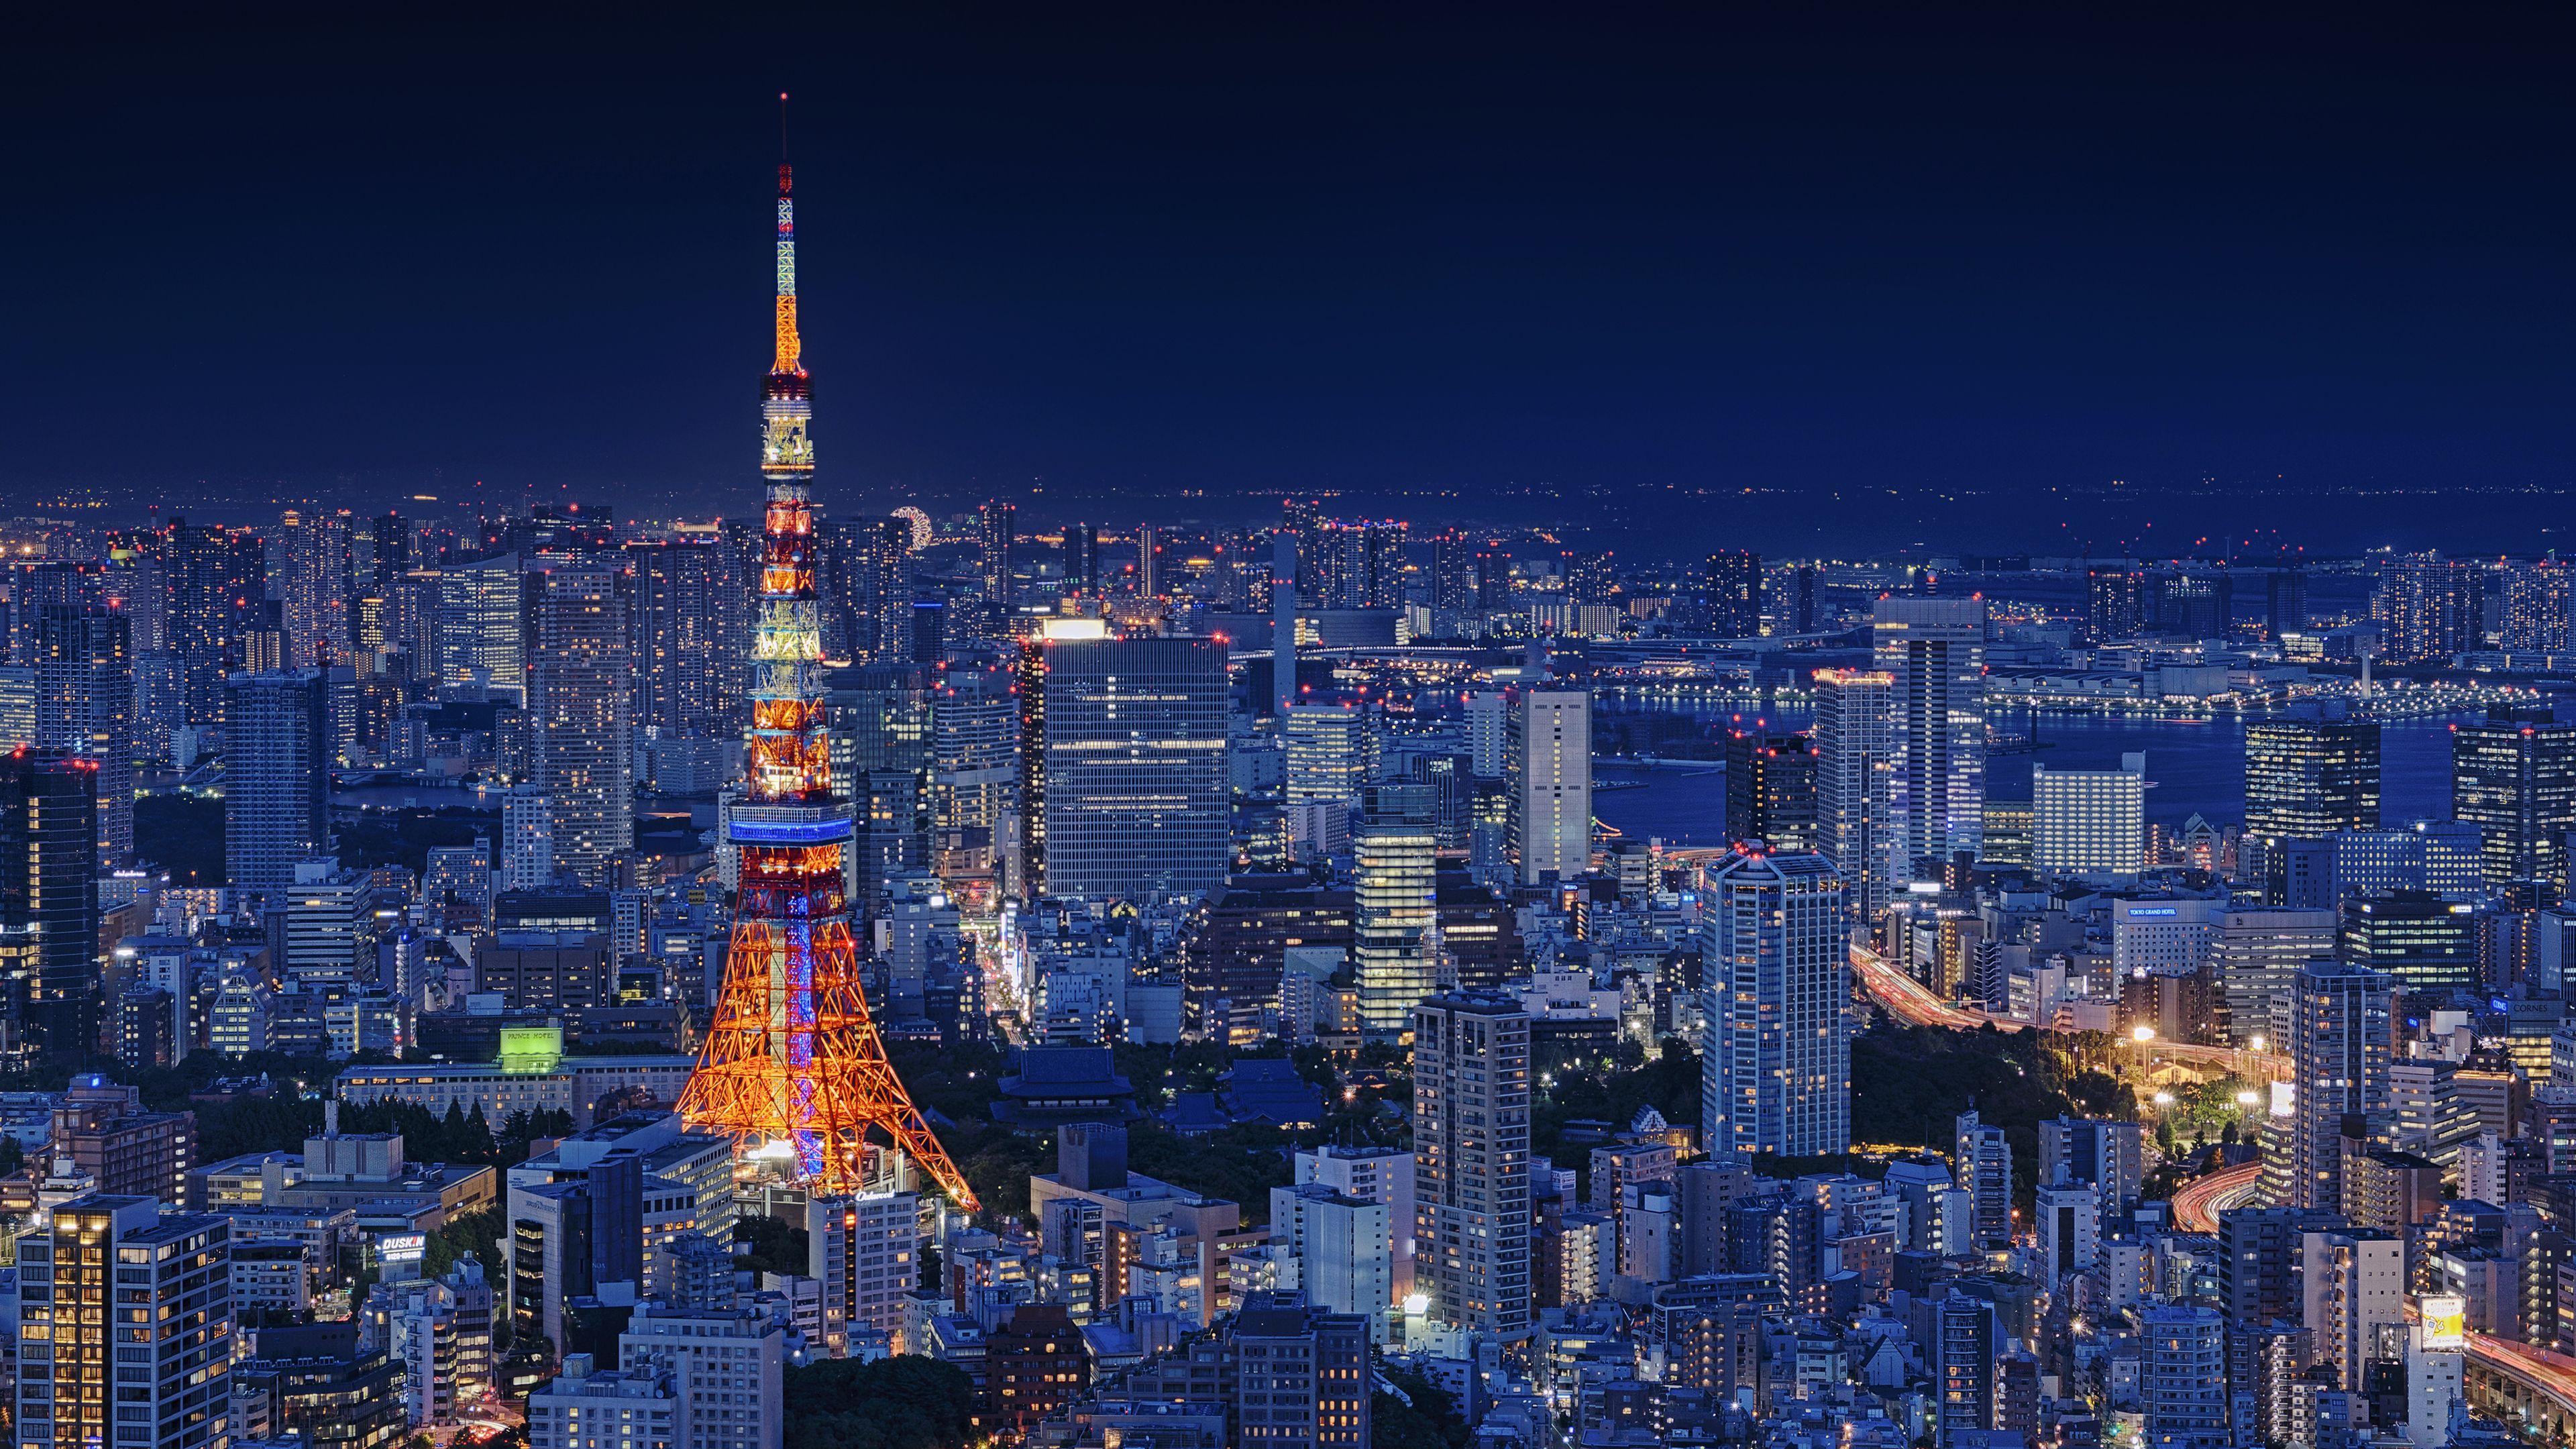 Tokyo 8k Wallpapers Top Free Tokyo 8k Backgrounds Wallpaperaccess